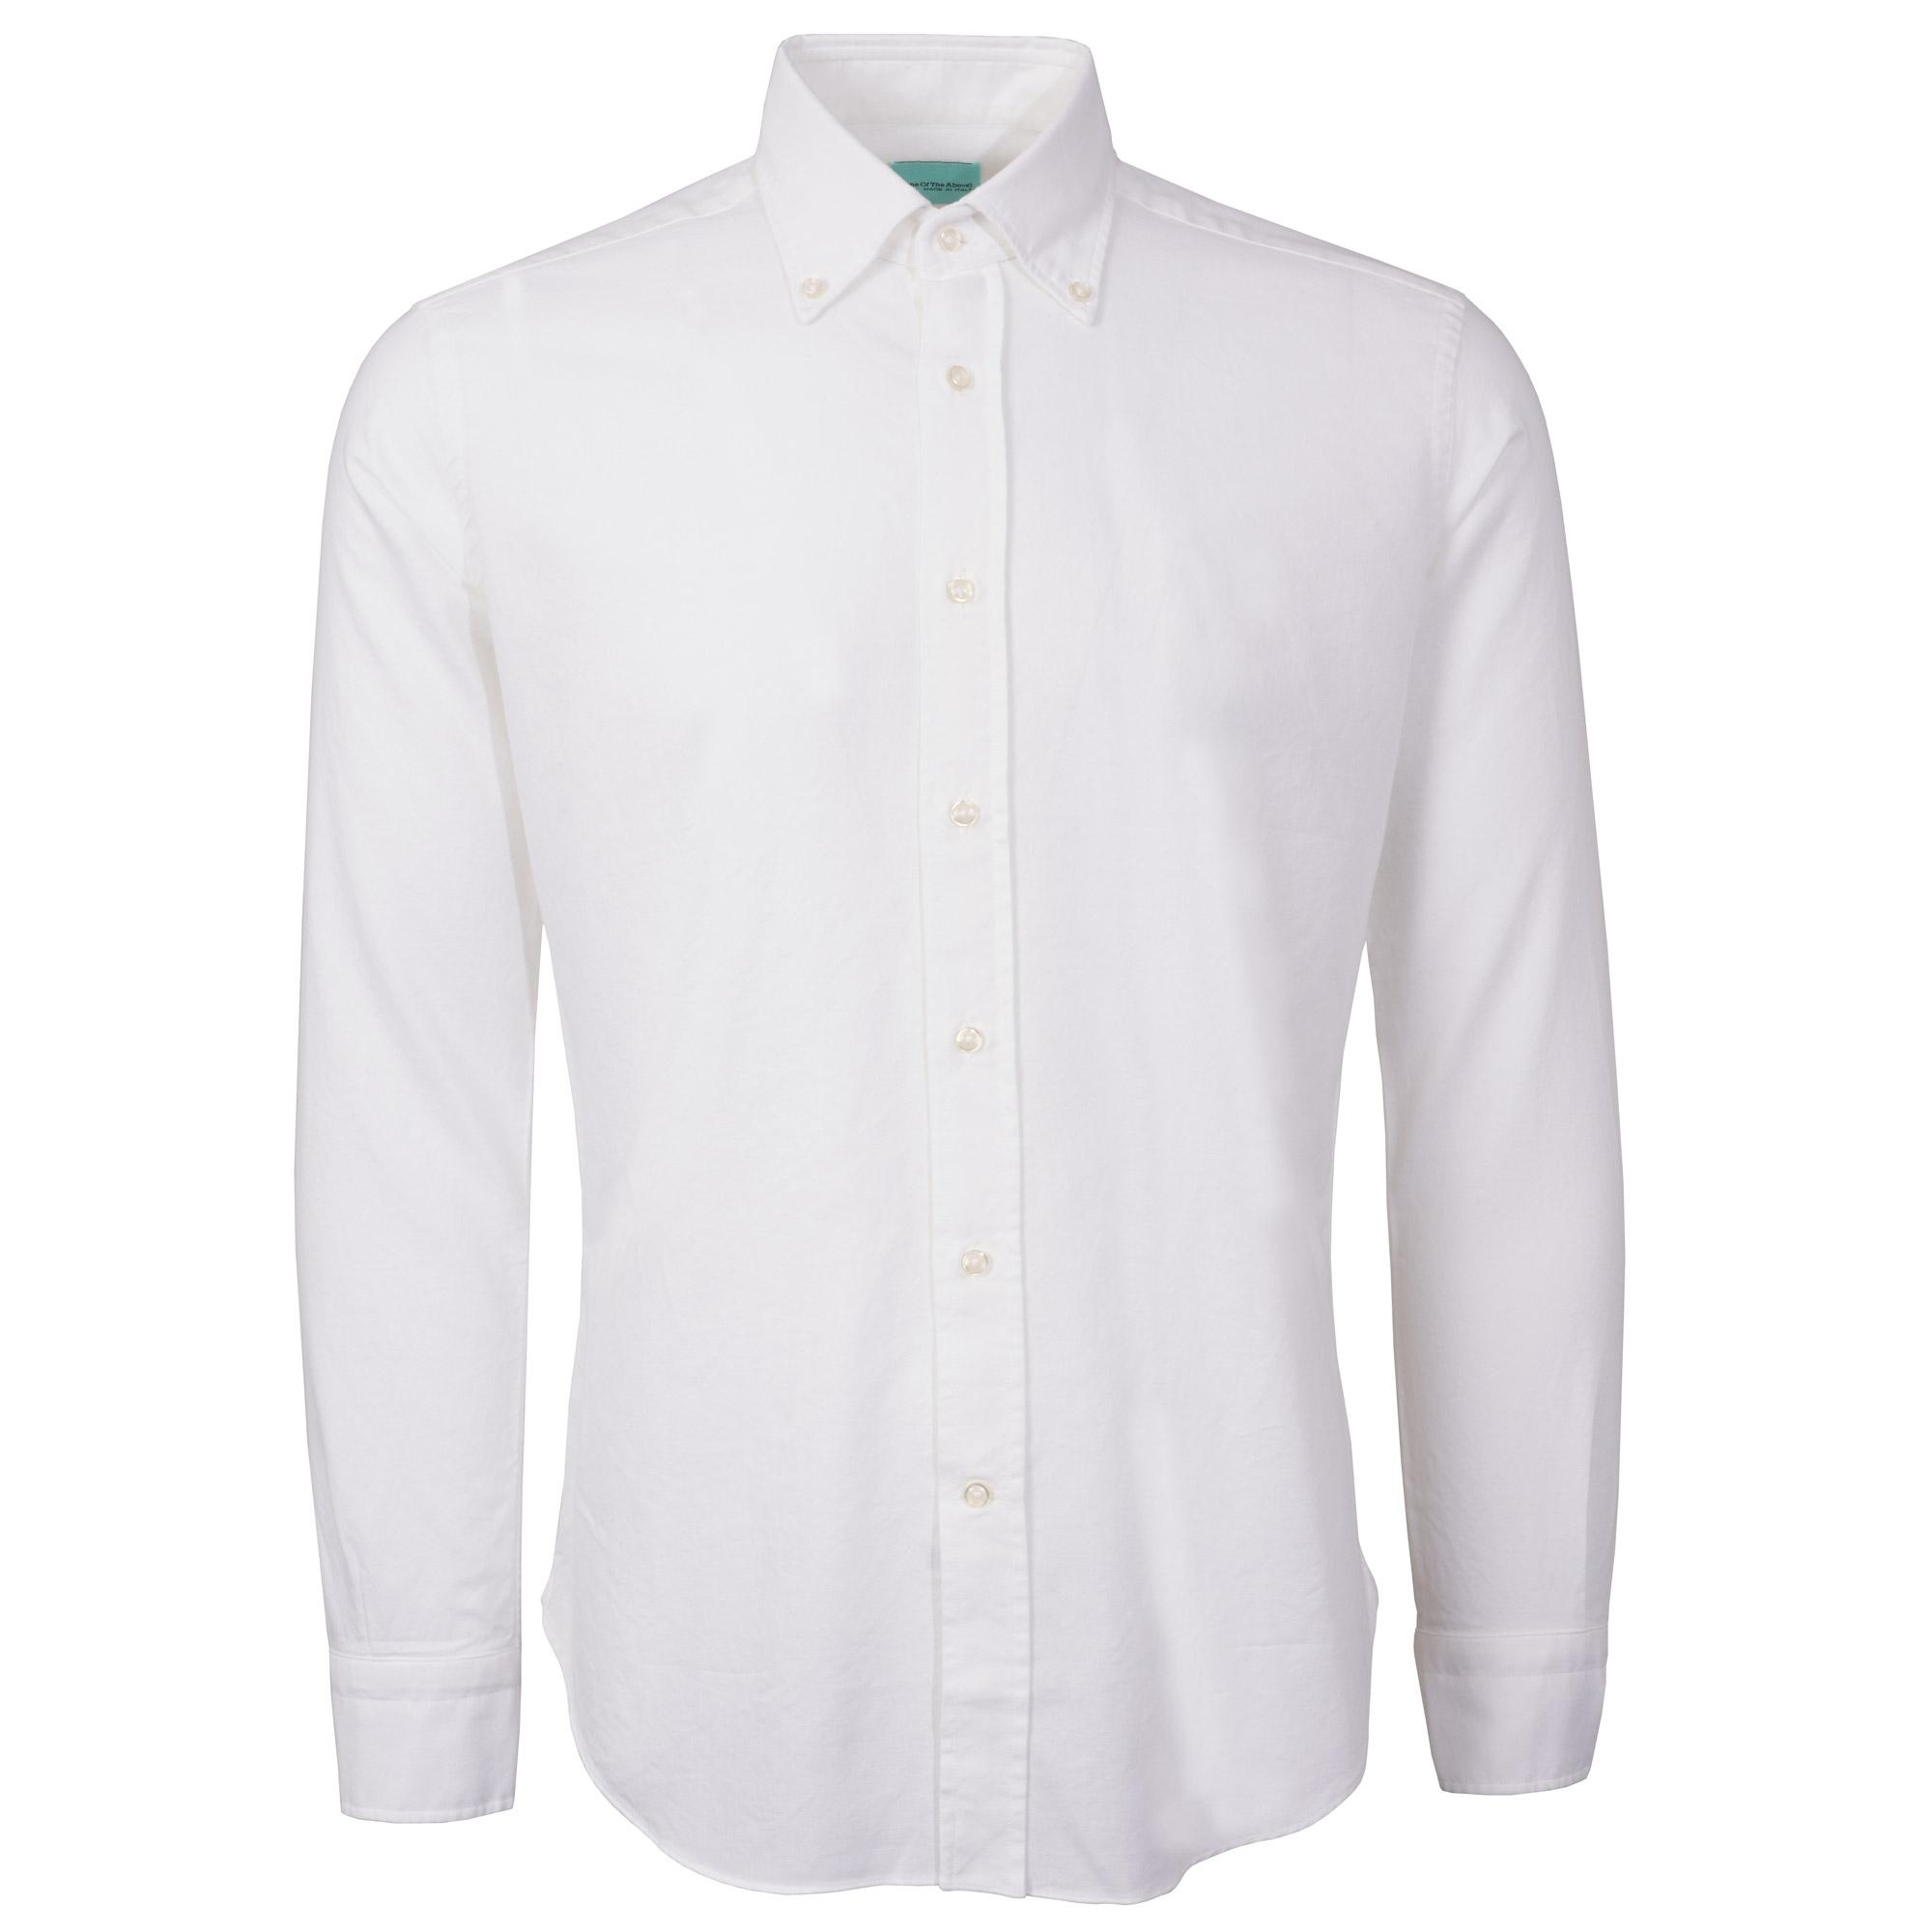 68133108ff2438 None Of The Above Oxford Shirt | White | NOTO-WHT